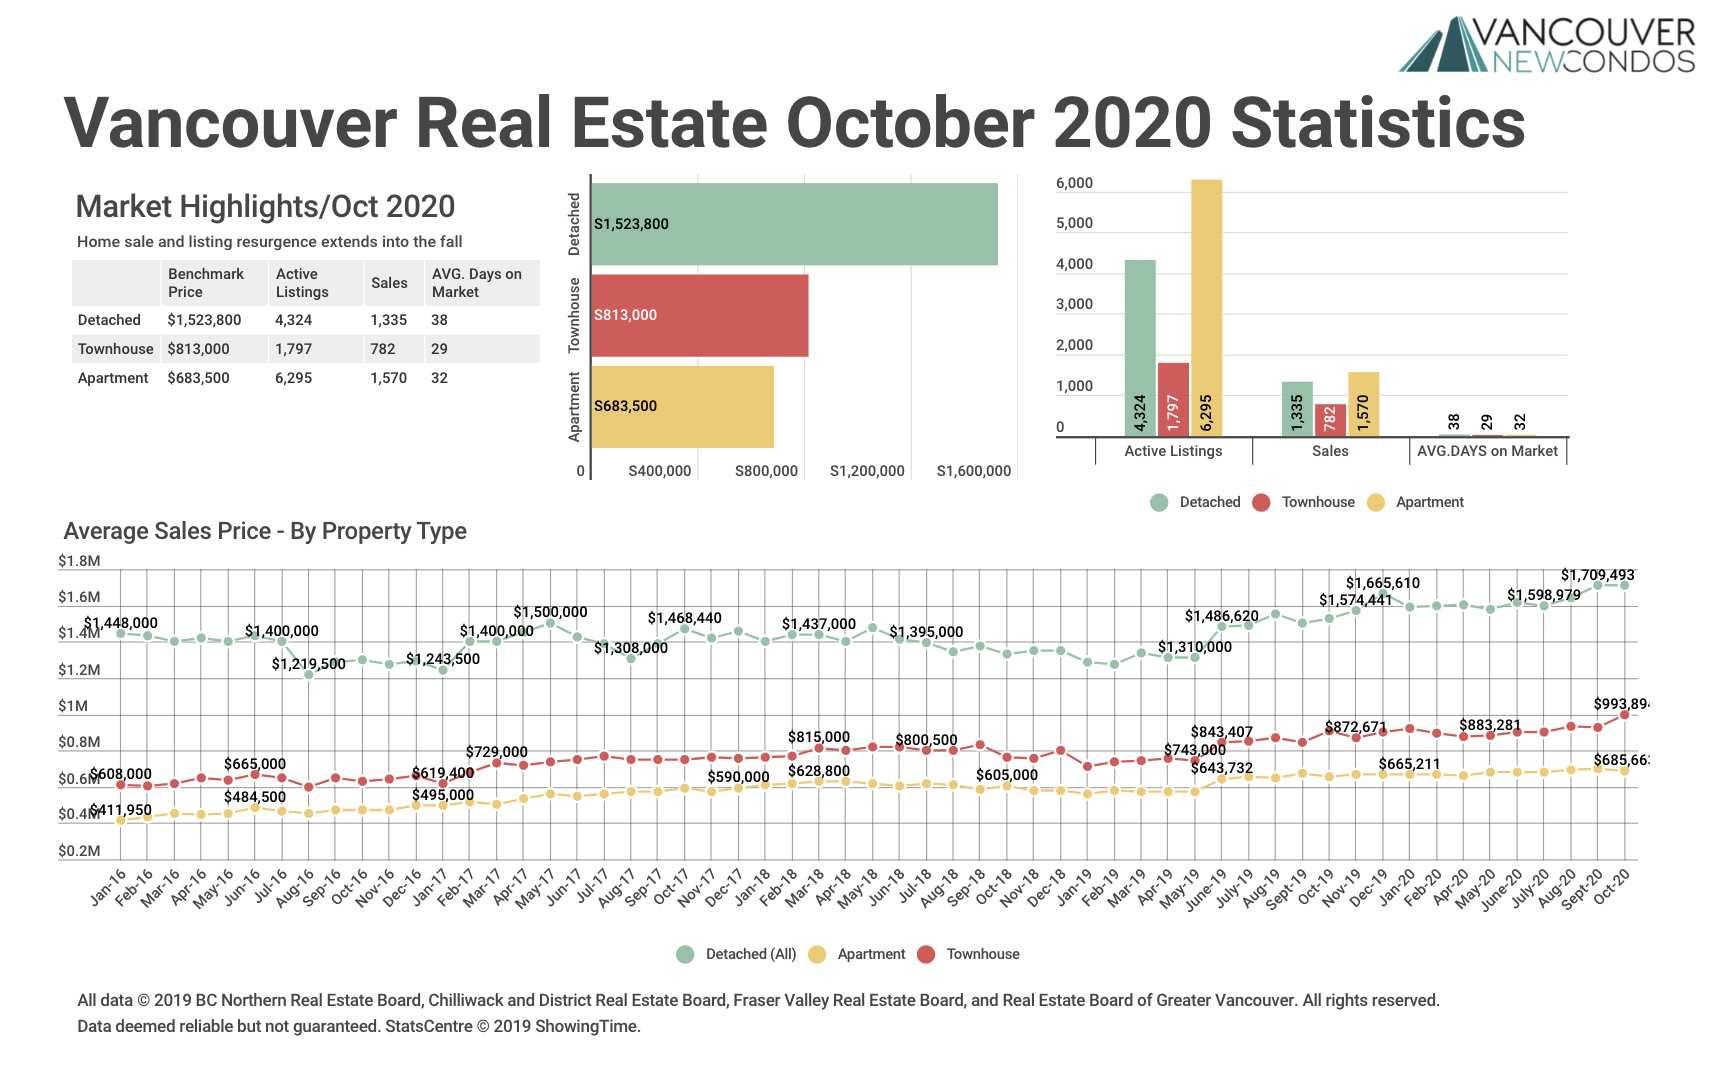 REBGV Oct 20 Stats Graph